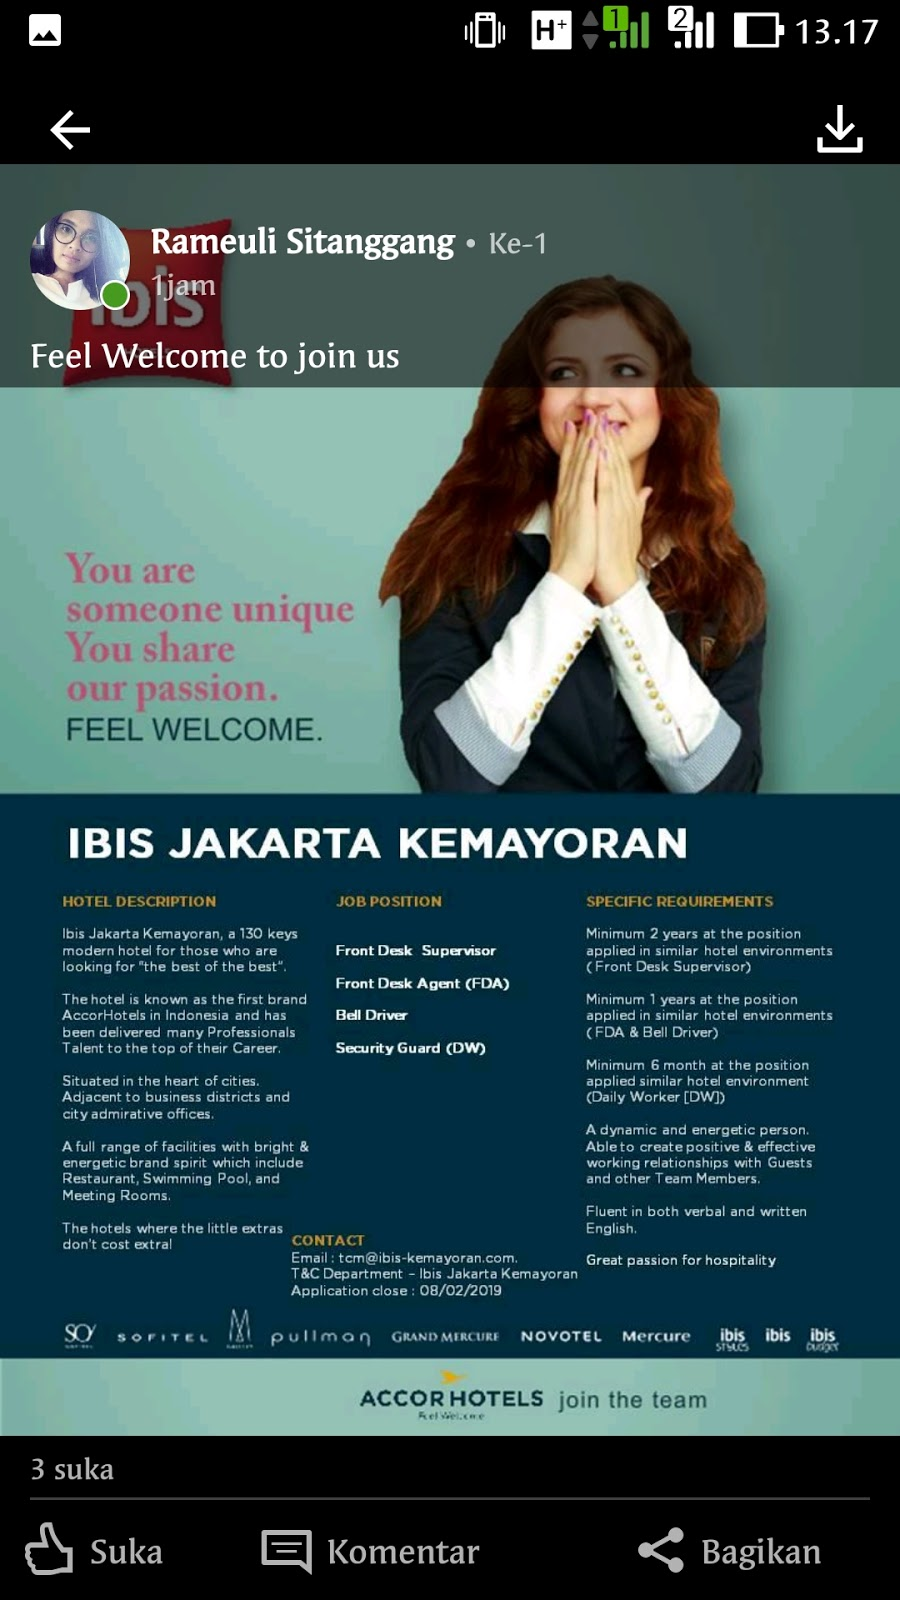 Lowongan Kerja Hotel Ibis Jakarta Kemayoran 4 Posisi Lowongan Kerja Hotel